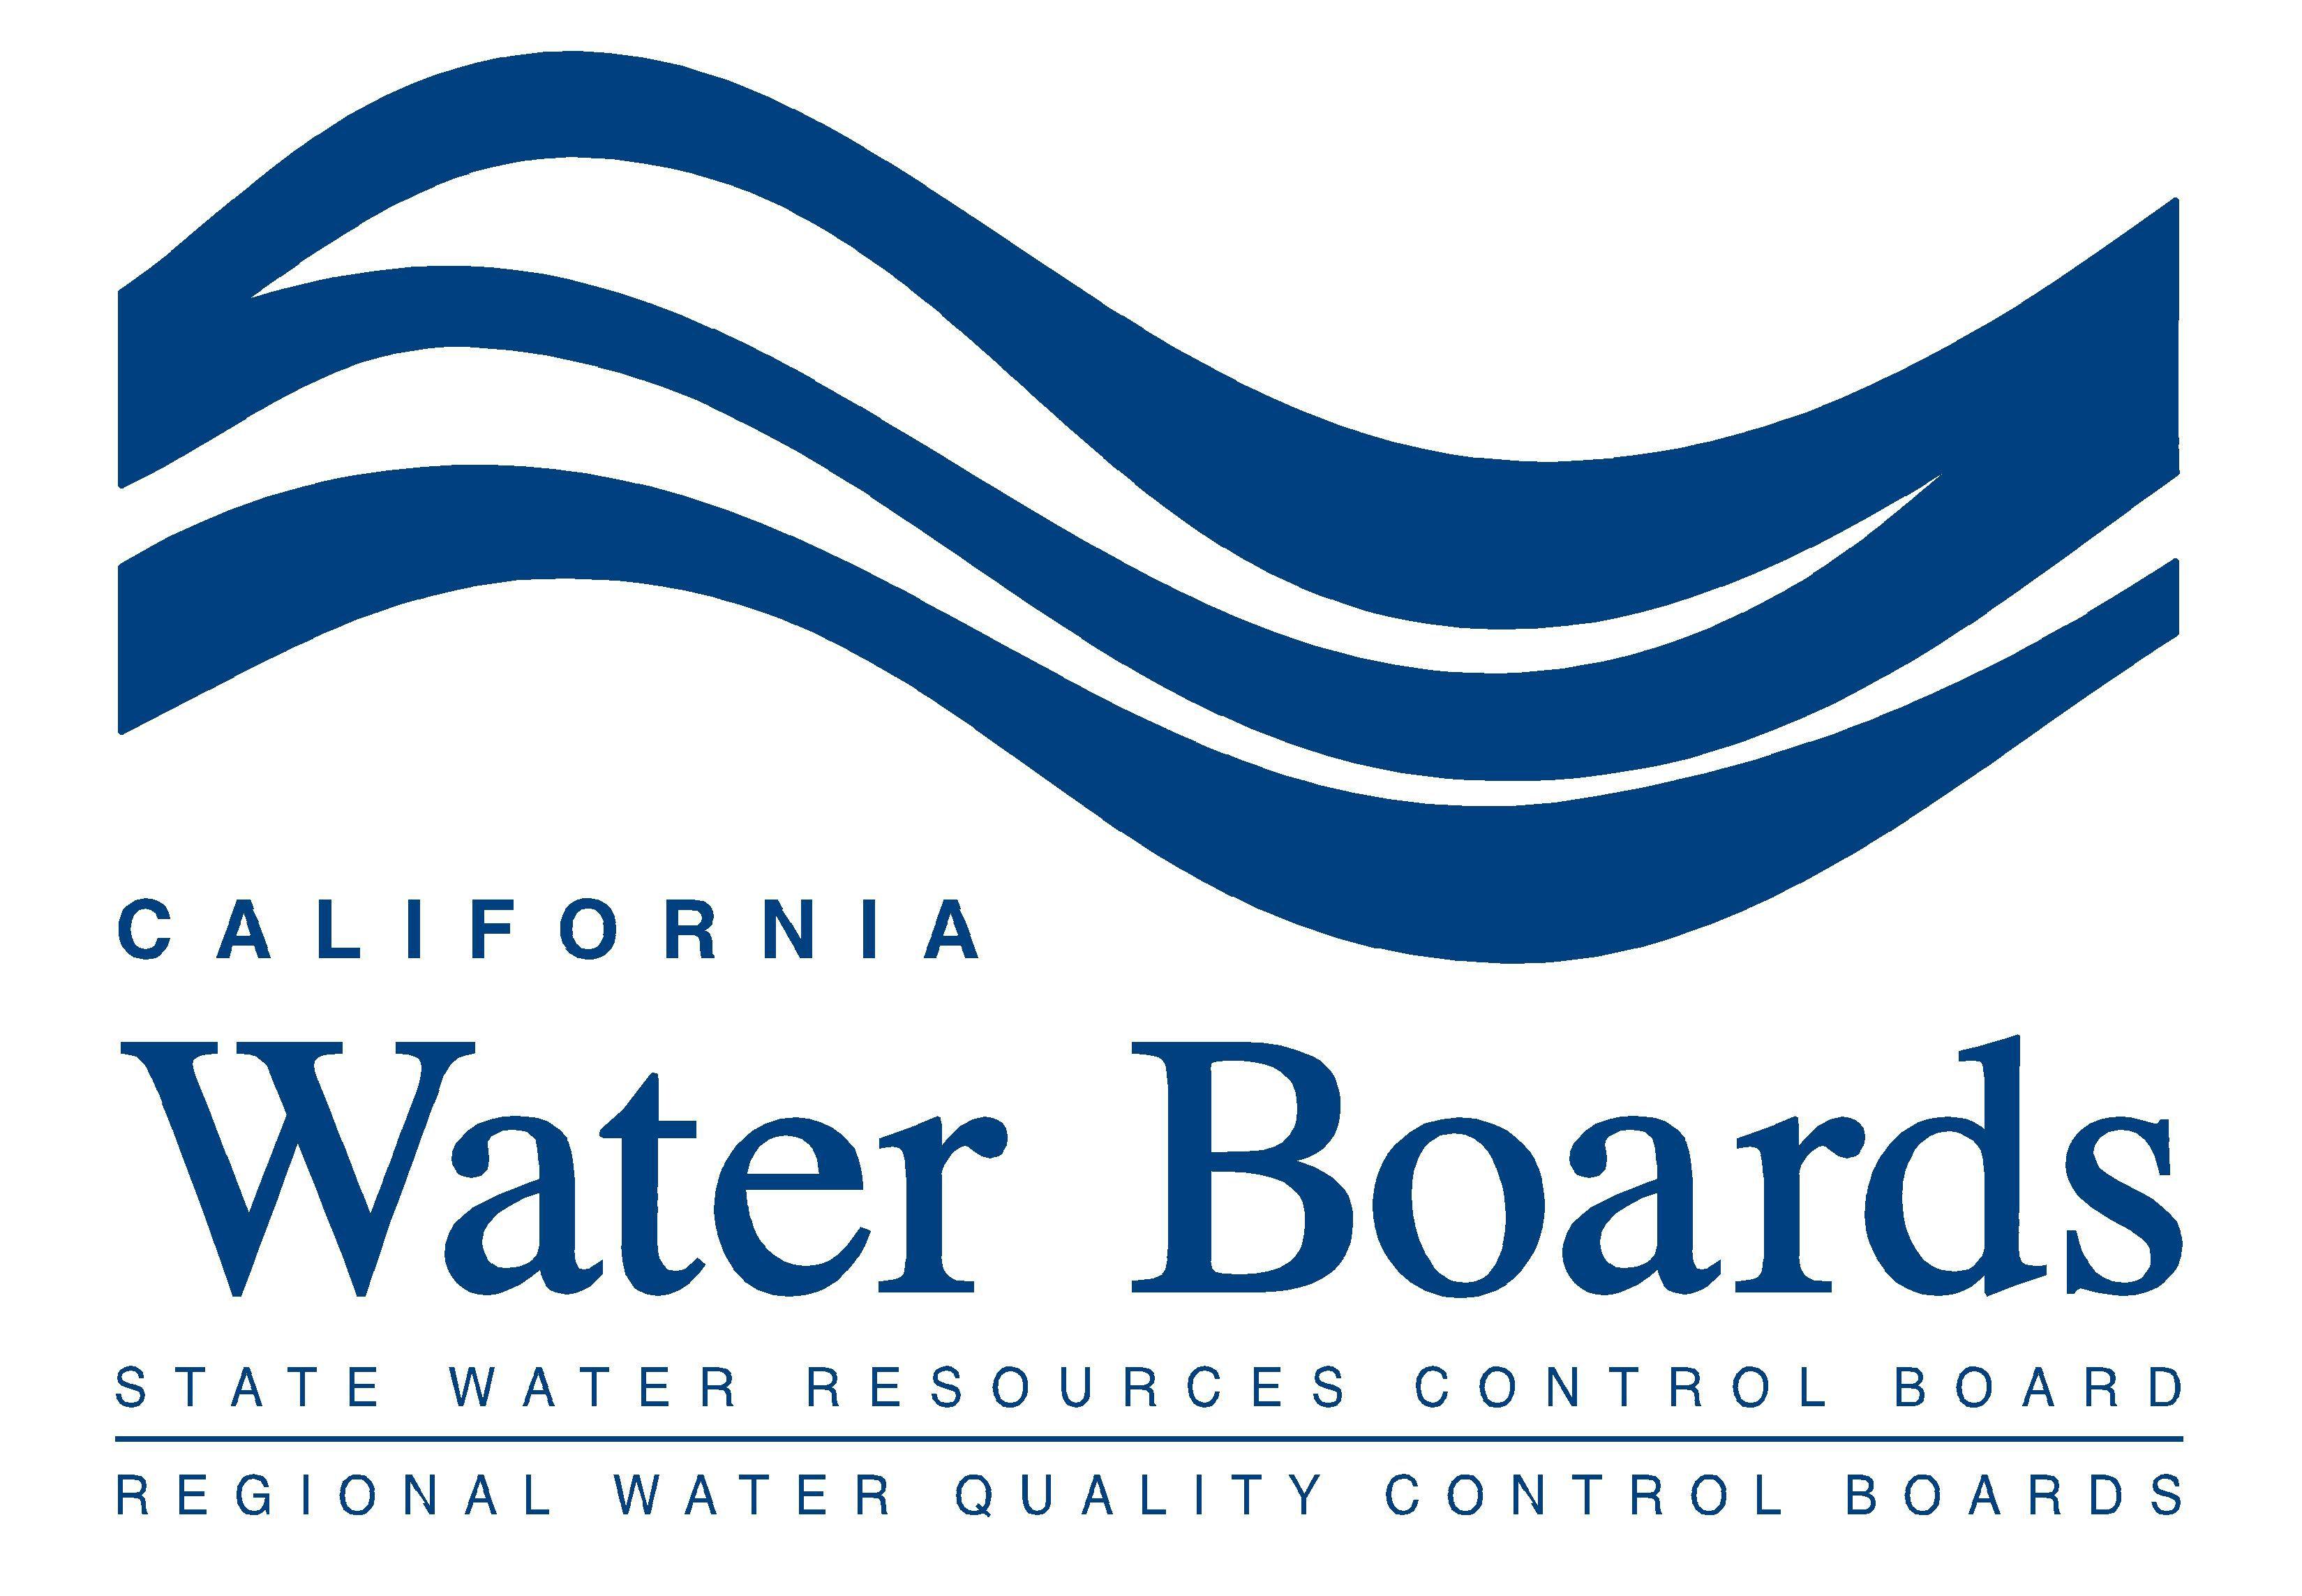 SWRCB-logo-water-boards